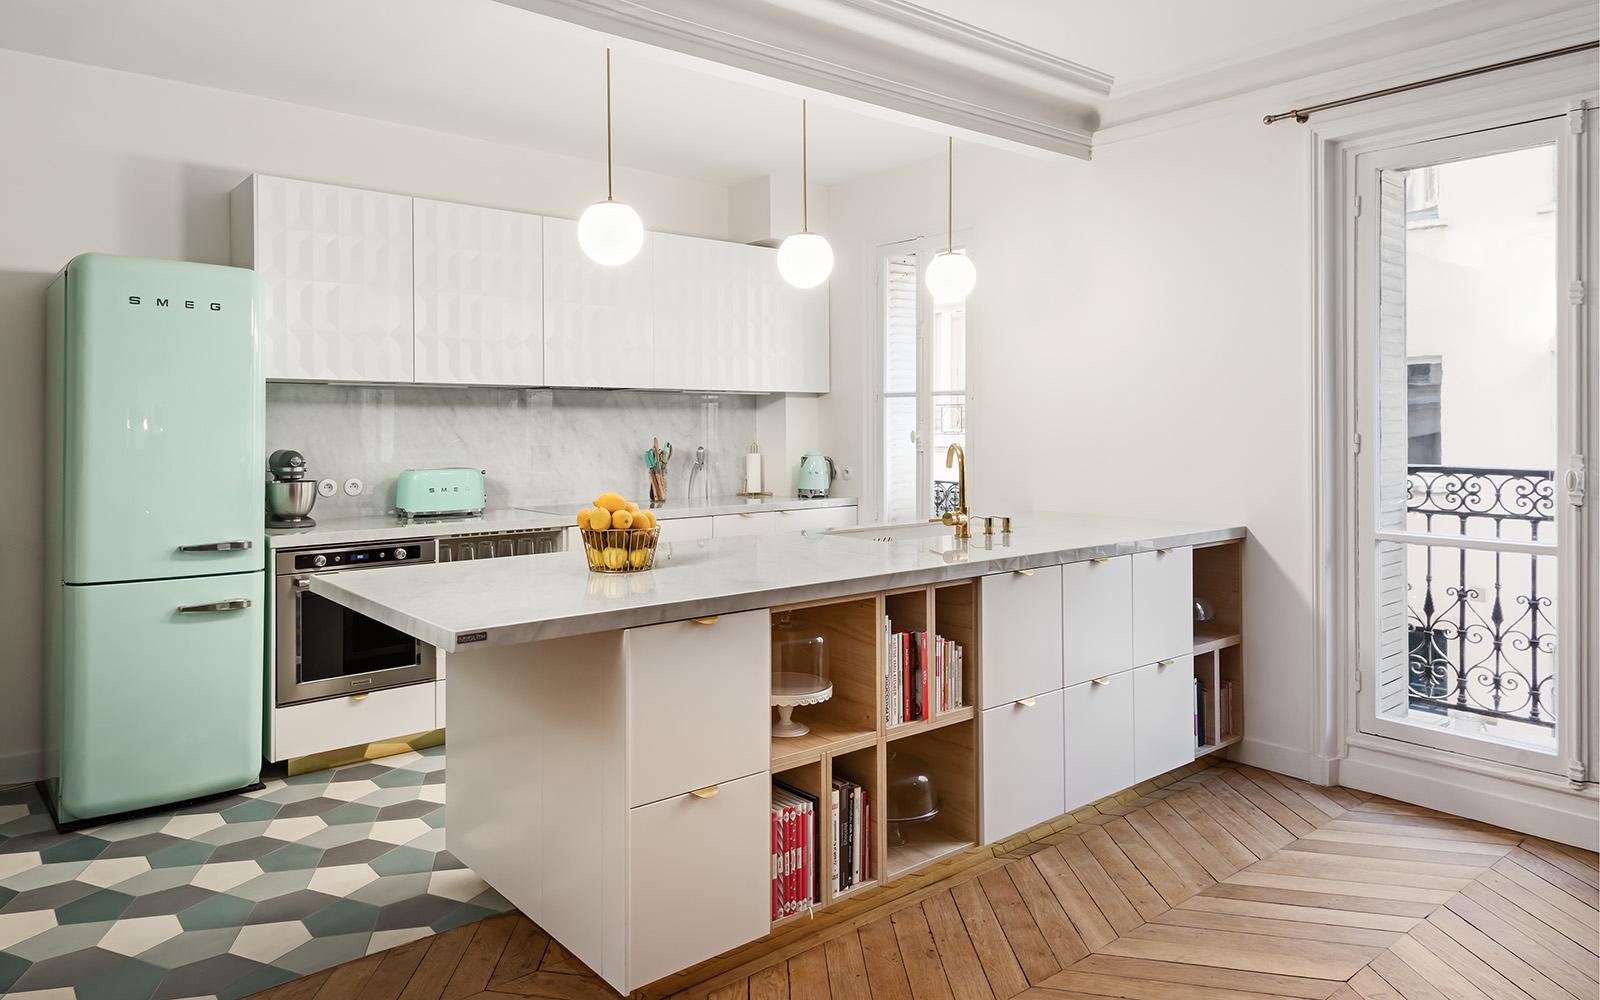 Kitchen worktop Neolith Blanco Carrara, natuursteen, marmer